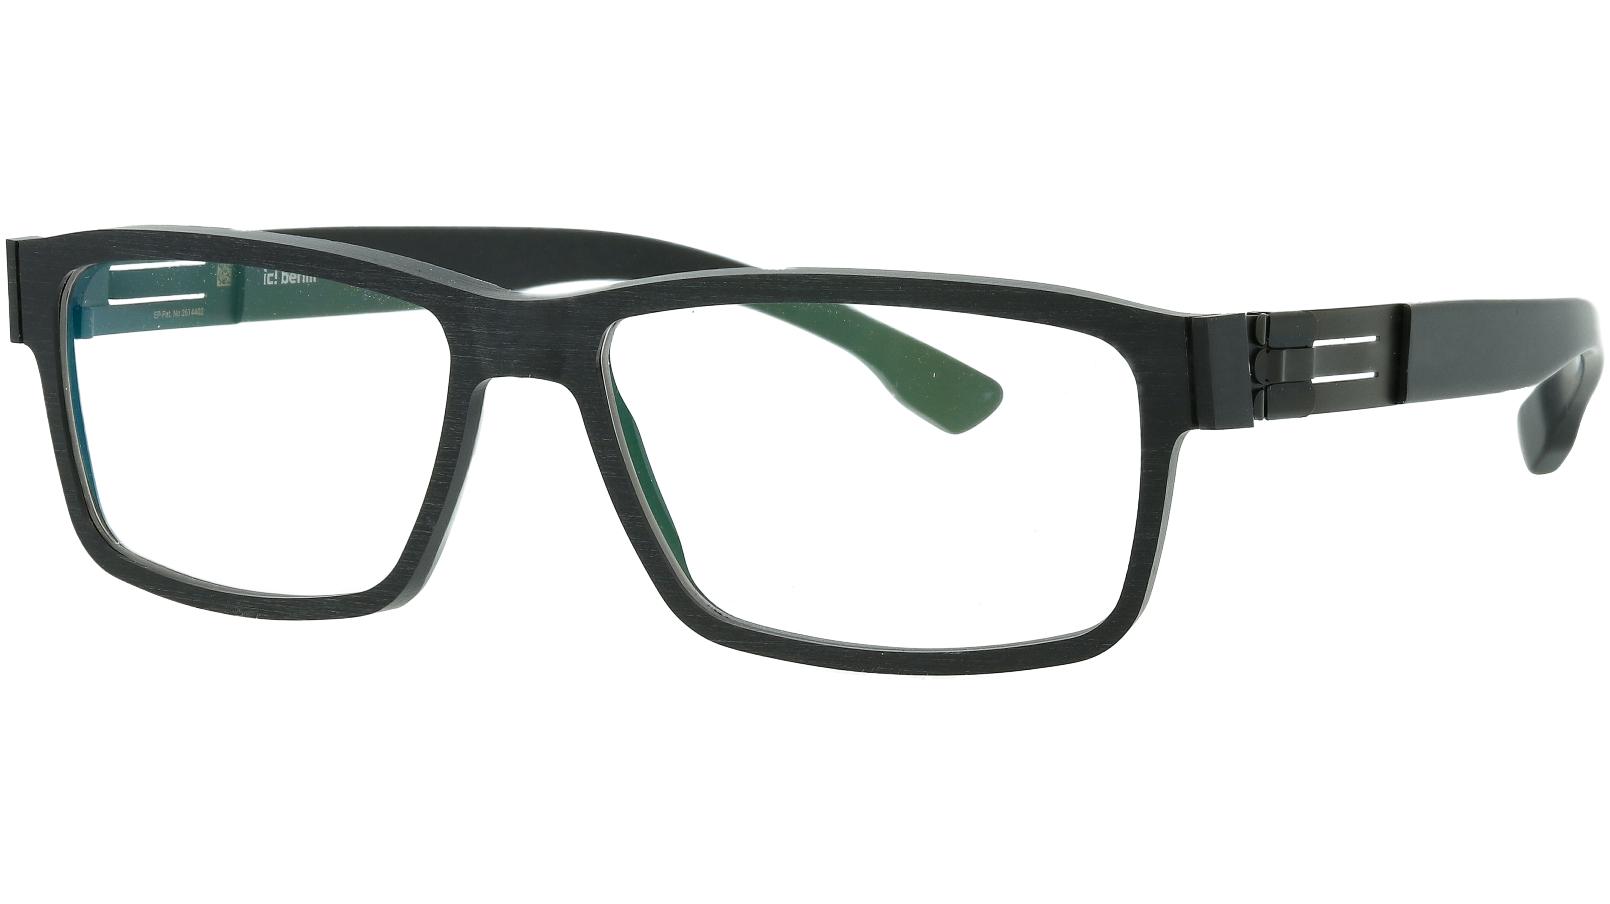 ic! Berlin Hack Black-Rough 55 Mittwoch Glasses